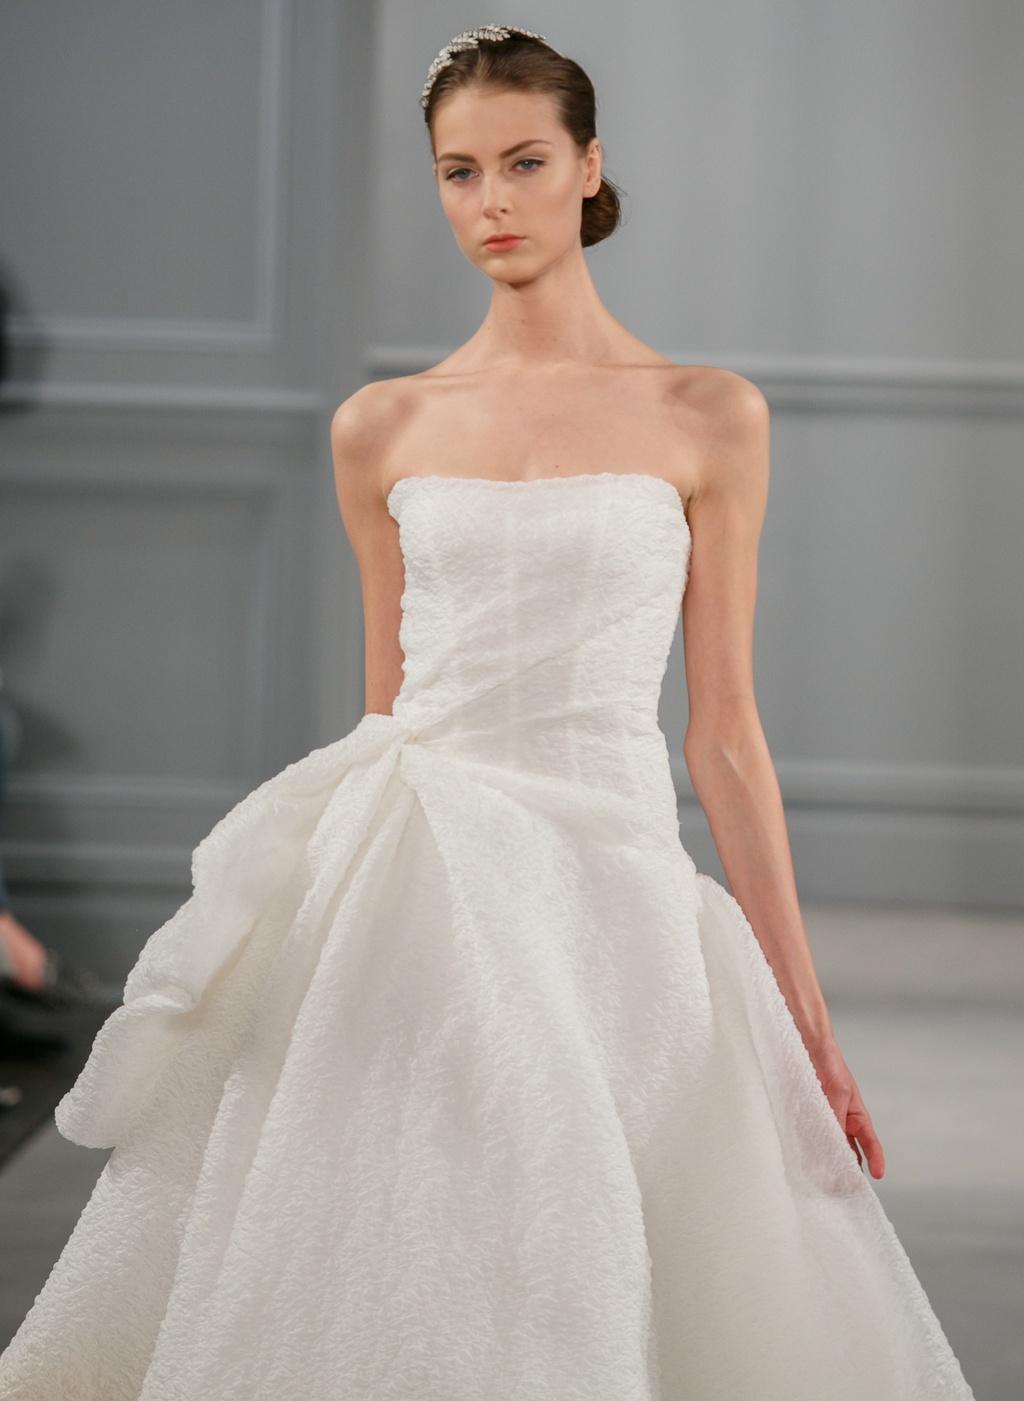 Spring-2014-wedding-dress-monique-lhuillier-bridal-paris-detail.full